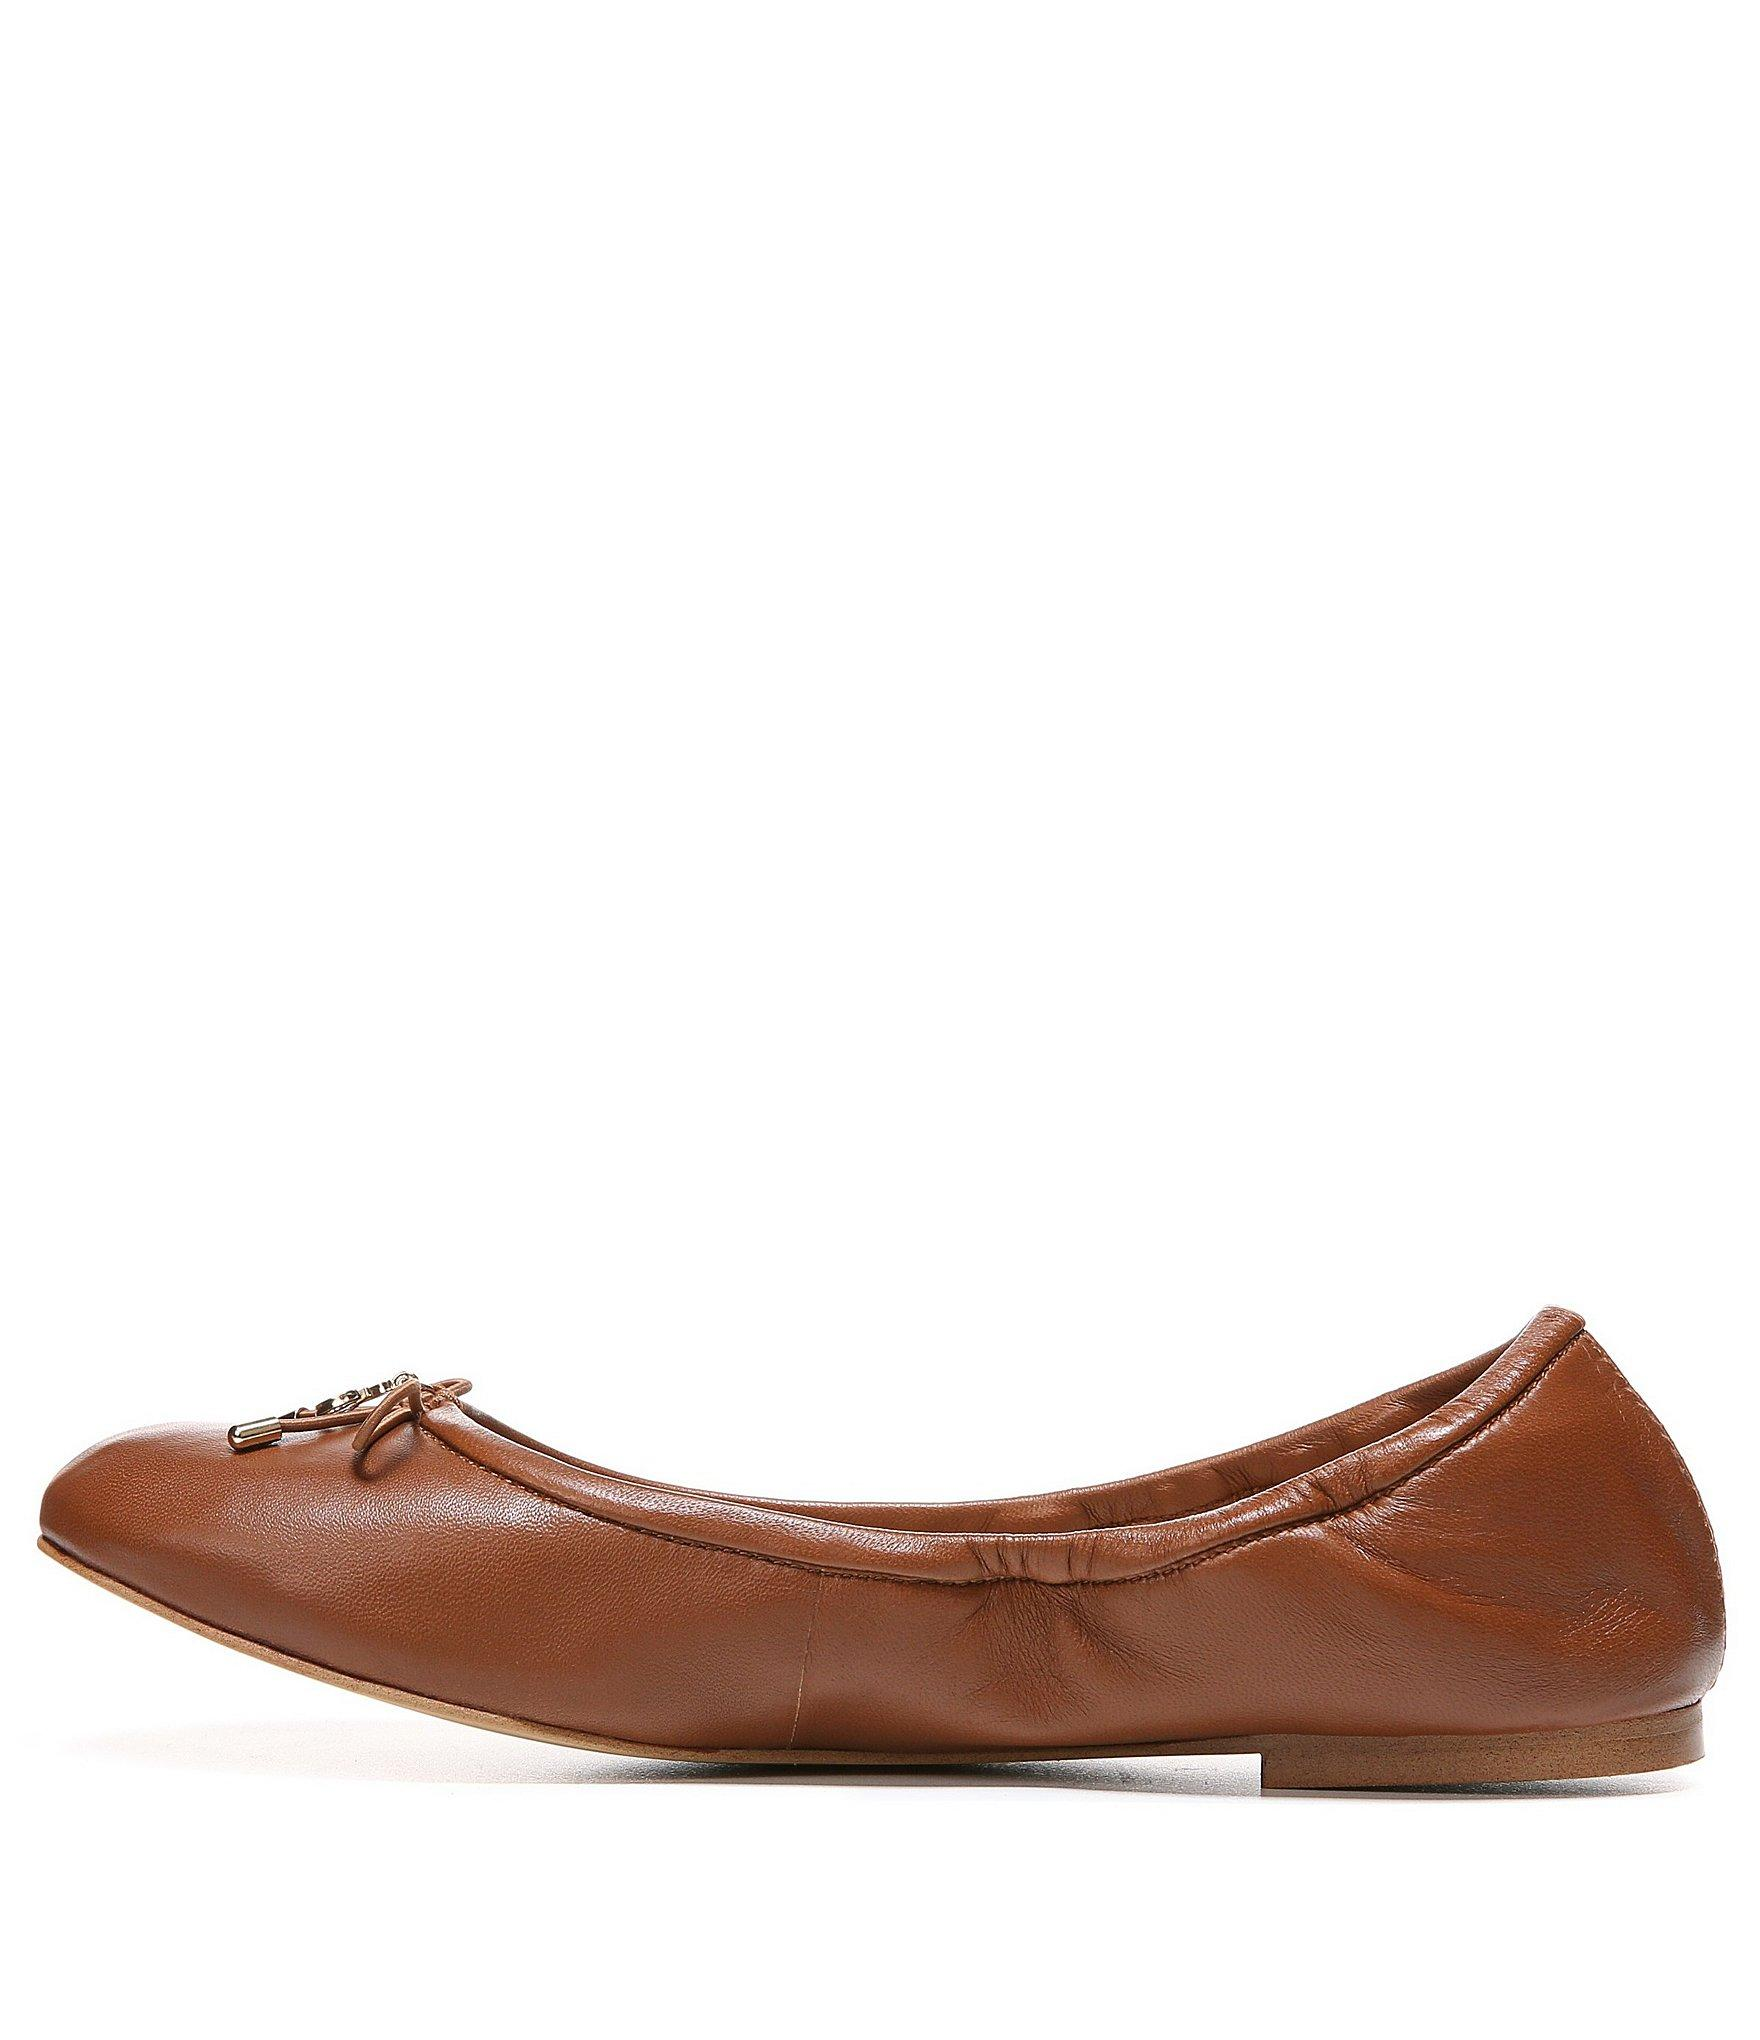 60a5580b1682b8 Sam Edelman - Brown Felicia Leather Ballet Flats - Lyst. View fullscreen